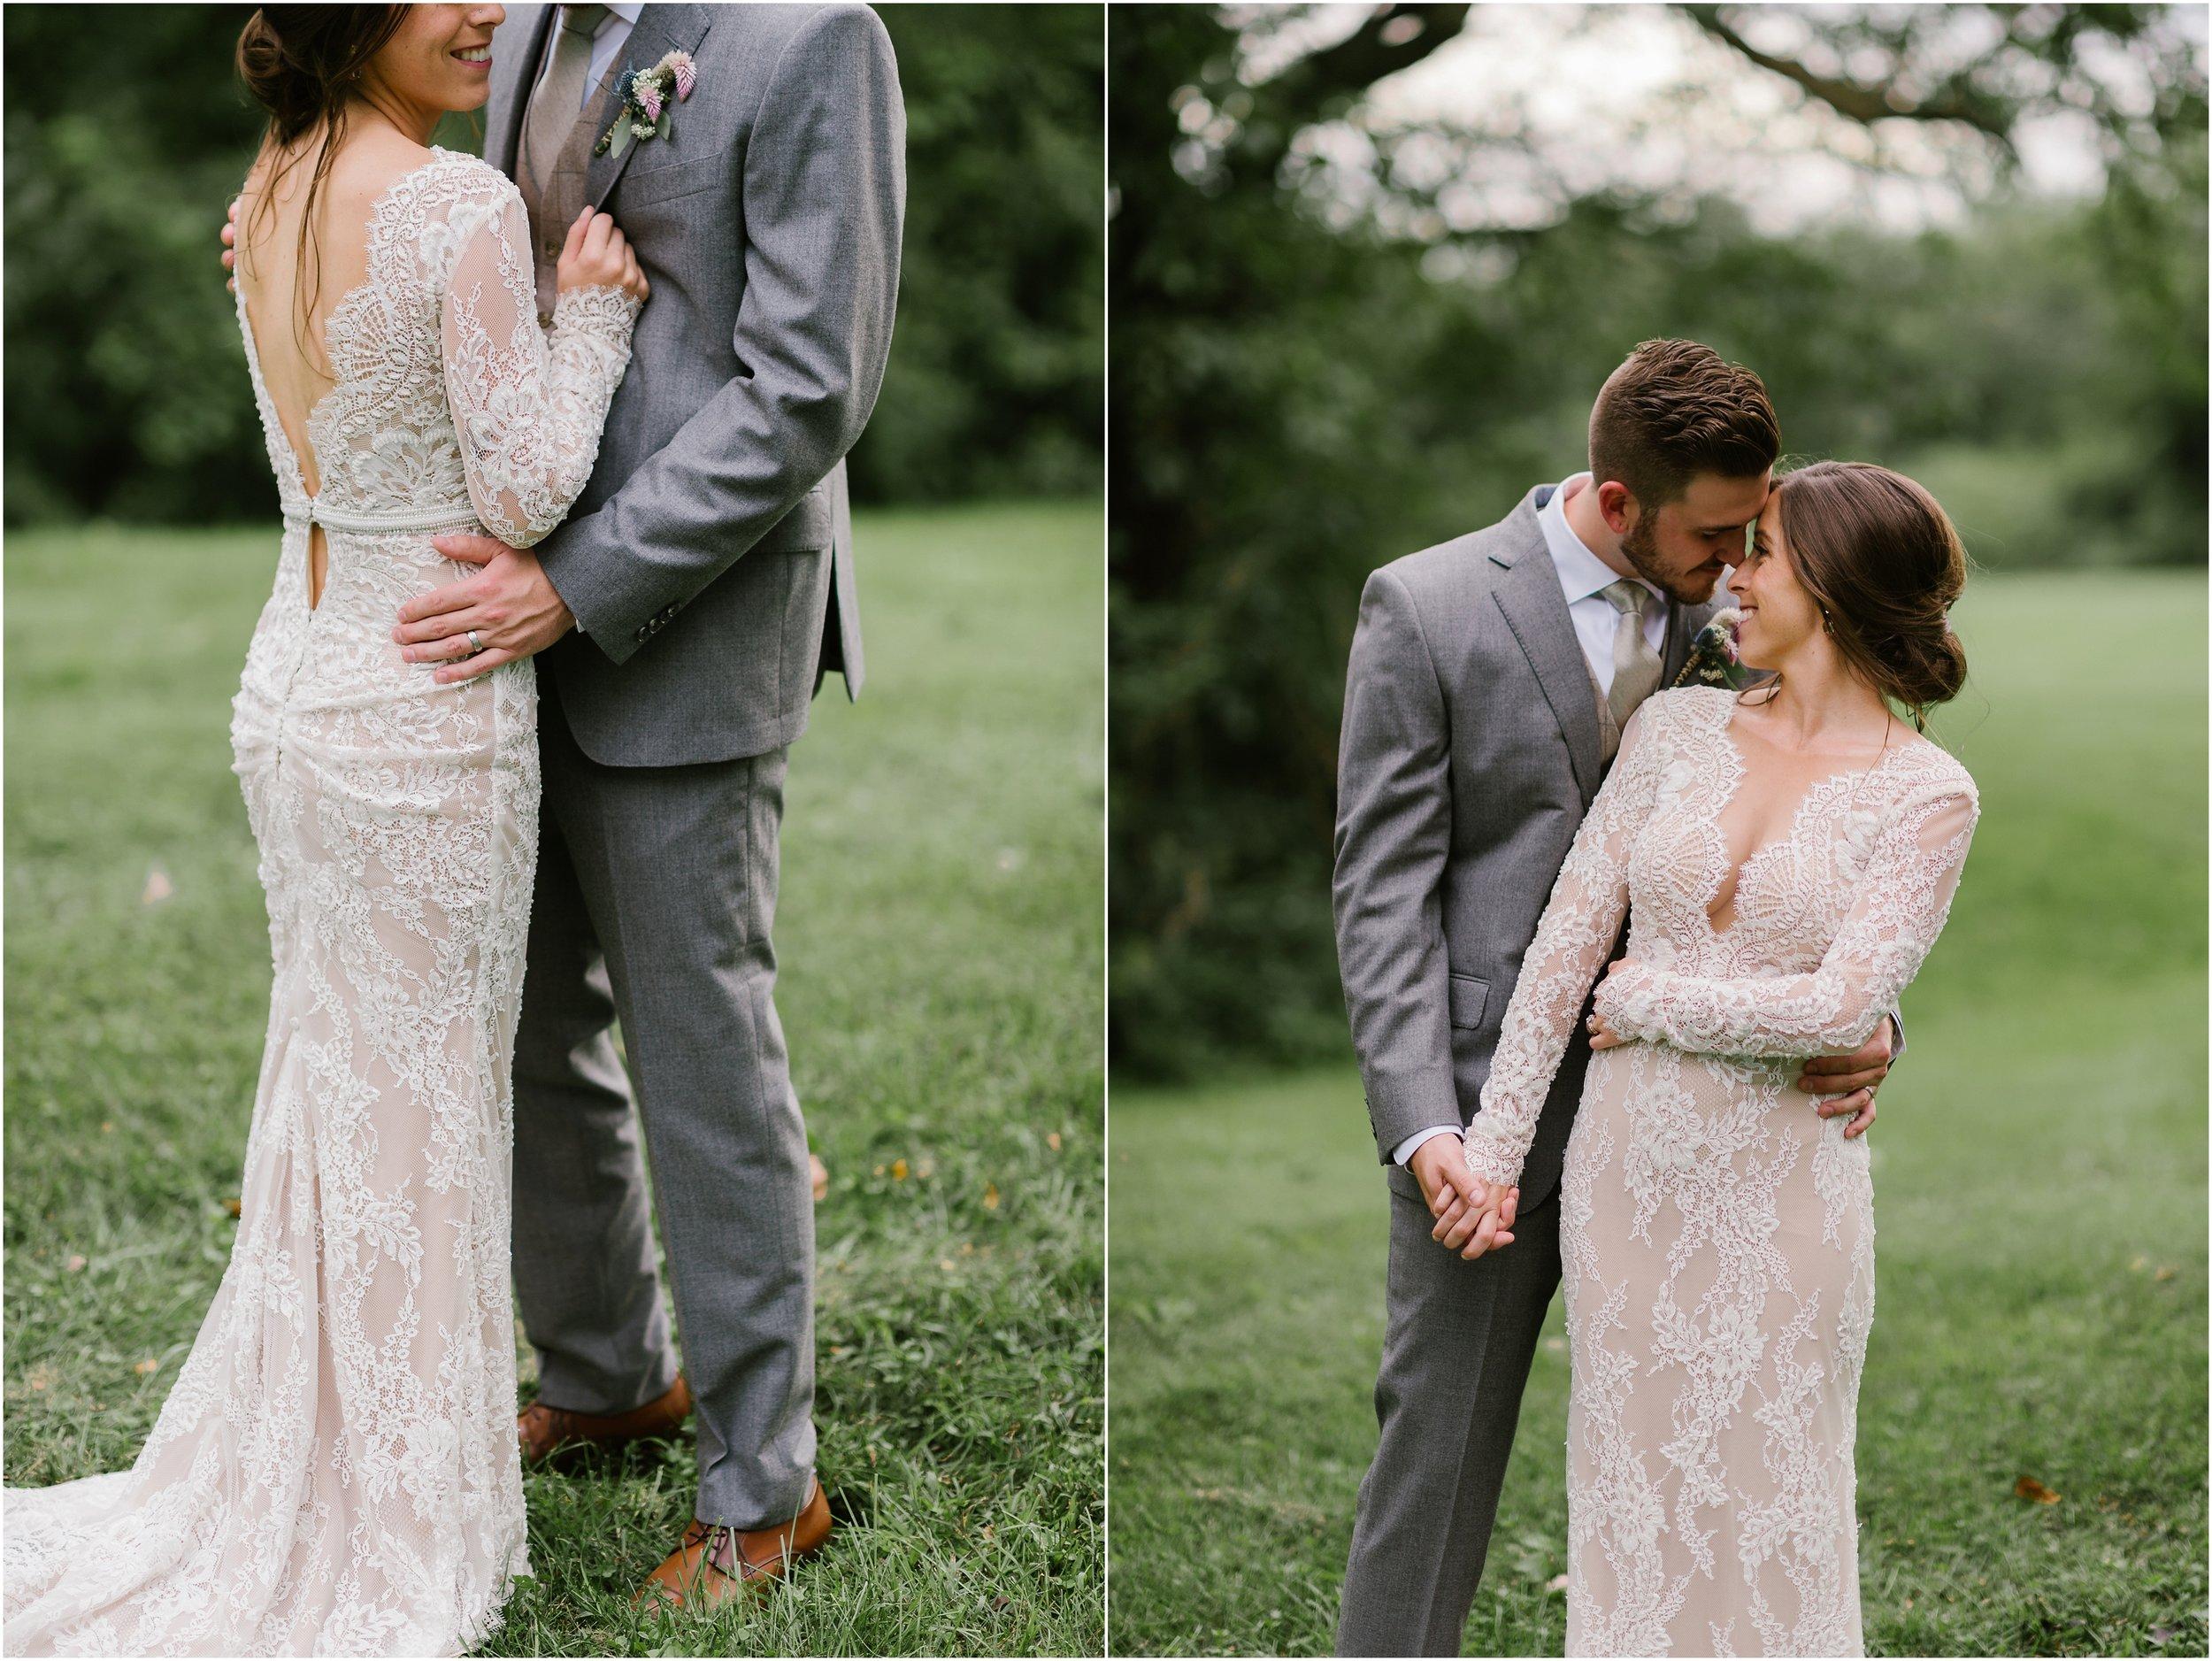 Rebecca_Shehorn_Photography_Indianapolis_Wedding_Photographer_9280.jpg